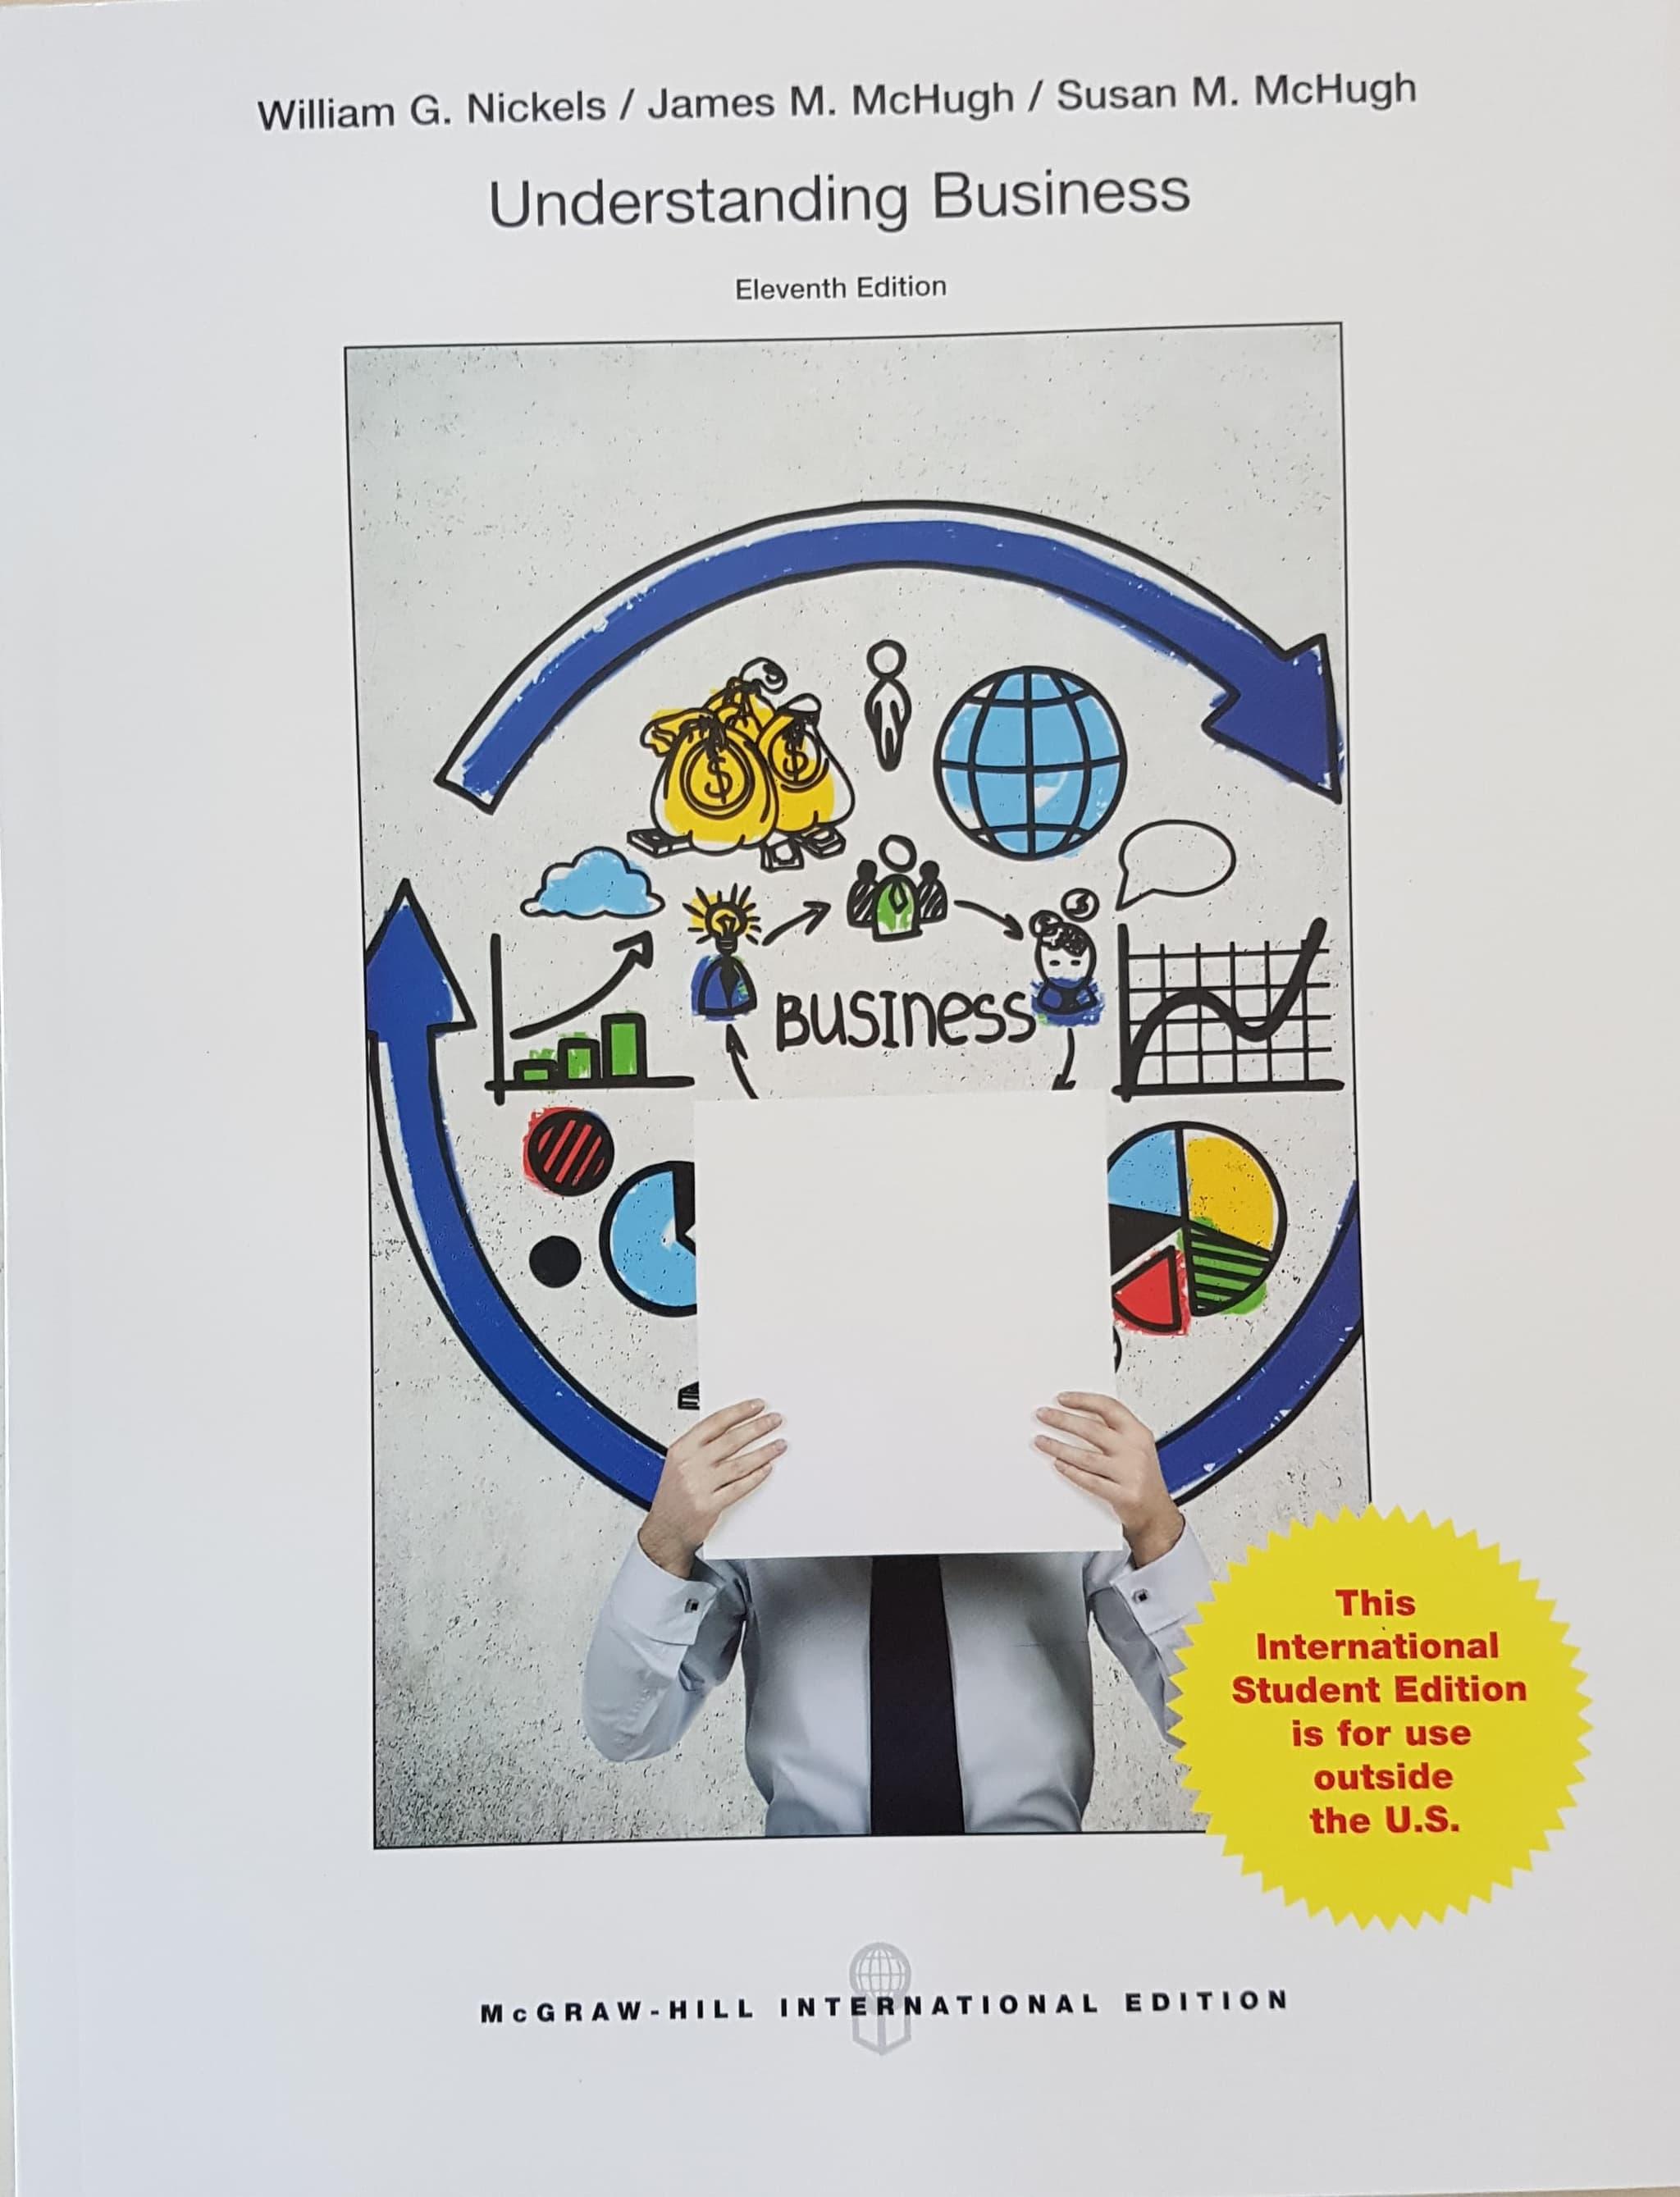 [ORIGINAL] Understanding Business 11e - Nickels